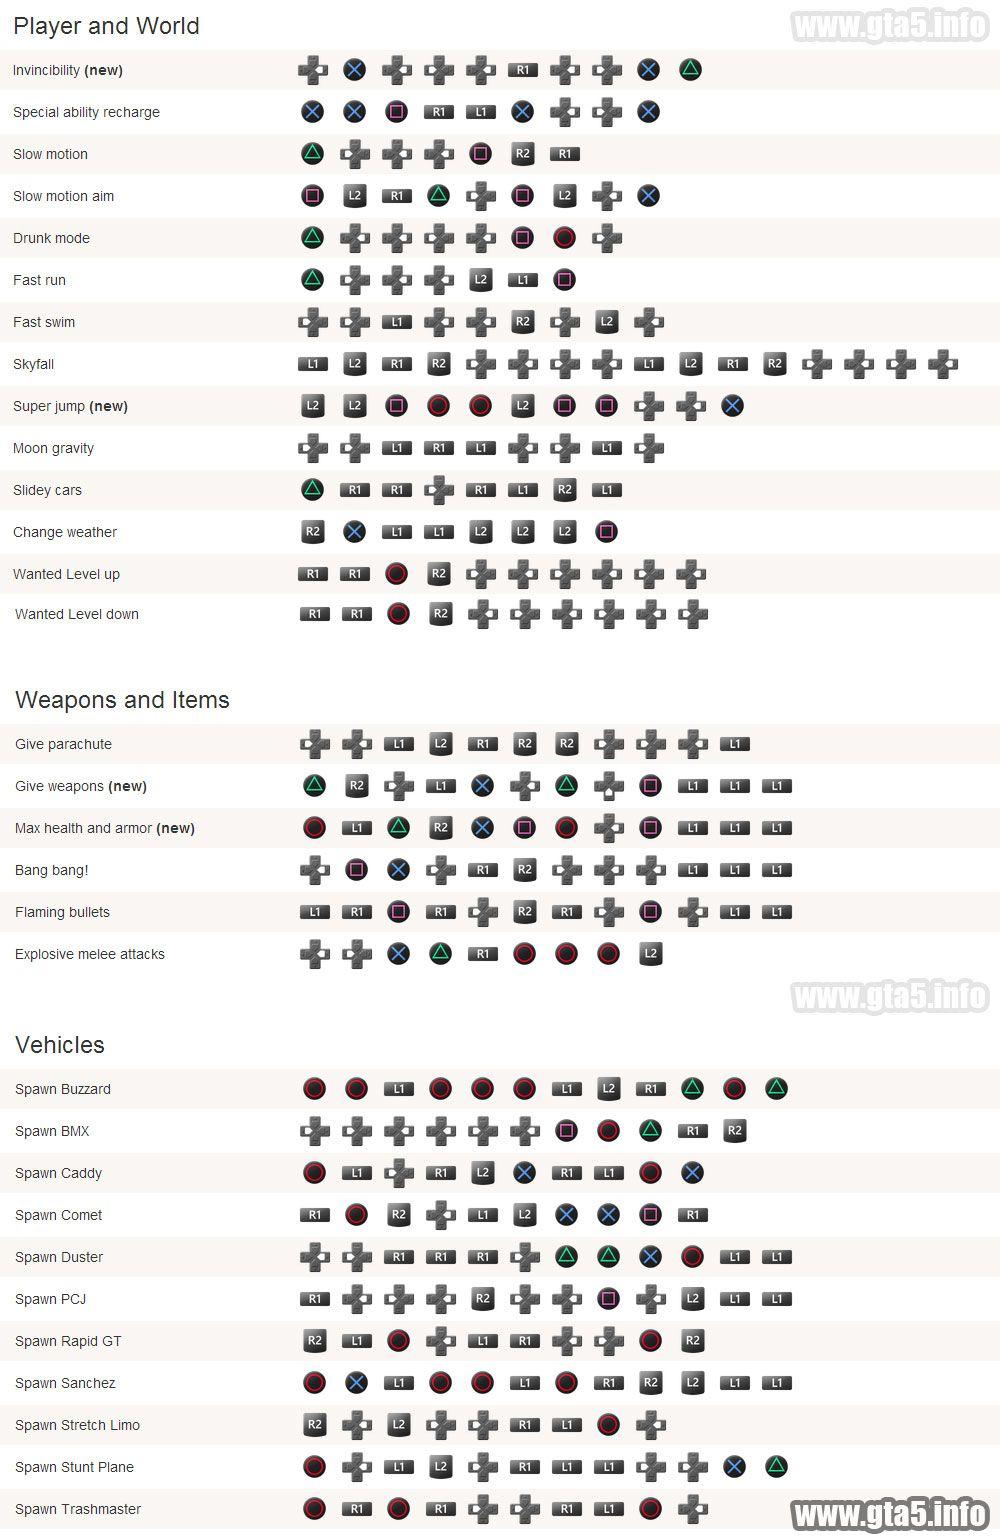 Gta 5 Cheats Ps4 Fast Cars : cheats, Machine, Unrated, Bluray, Adroiryo, 浮気された,, グランドセフトオート,, 手編み